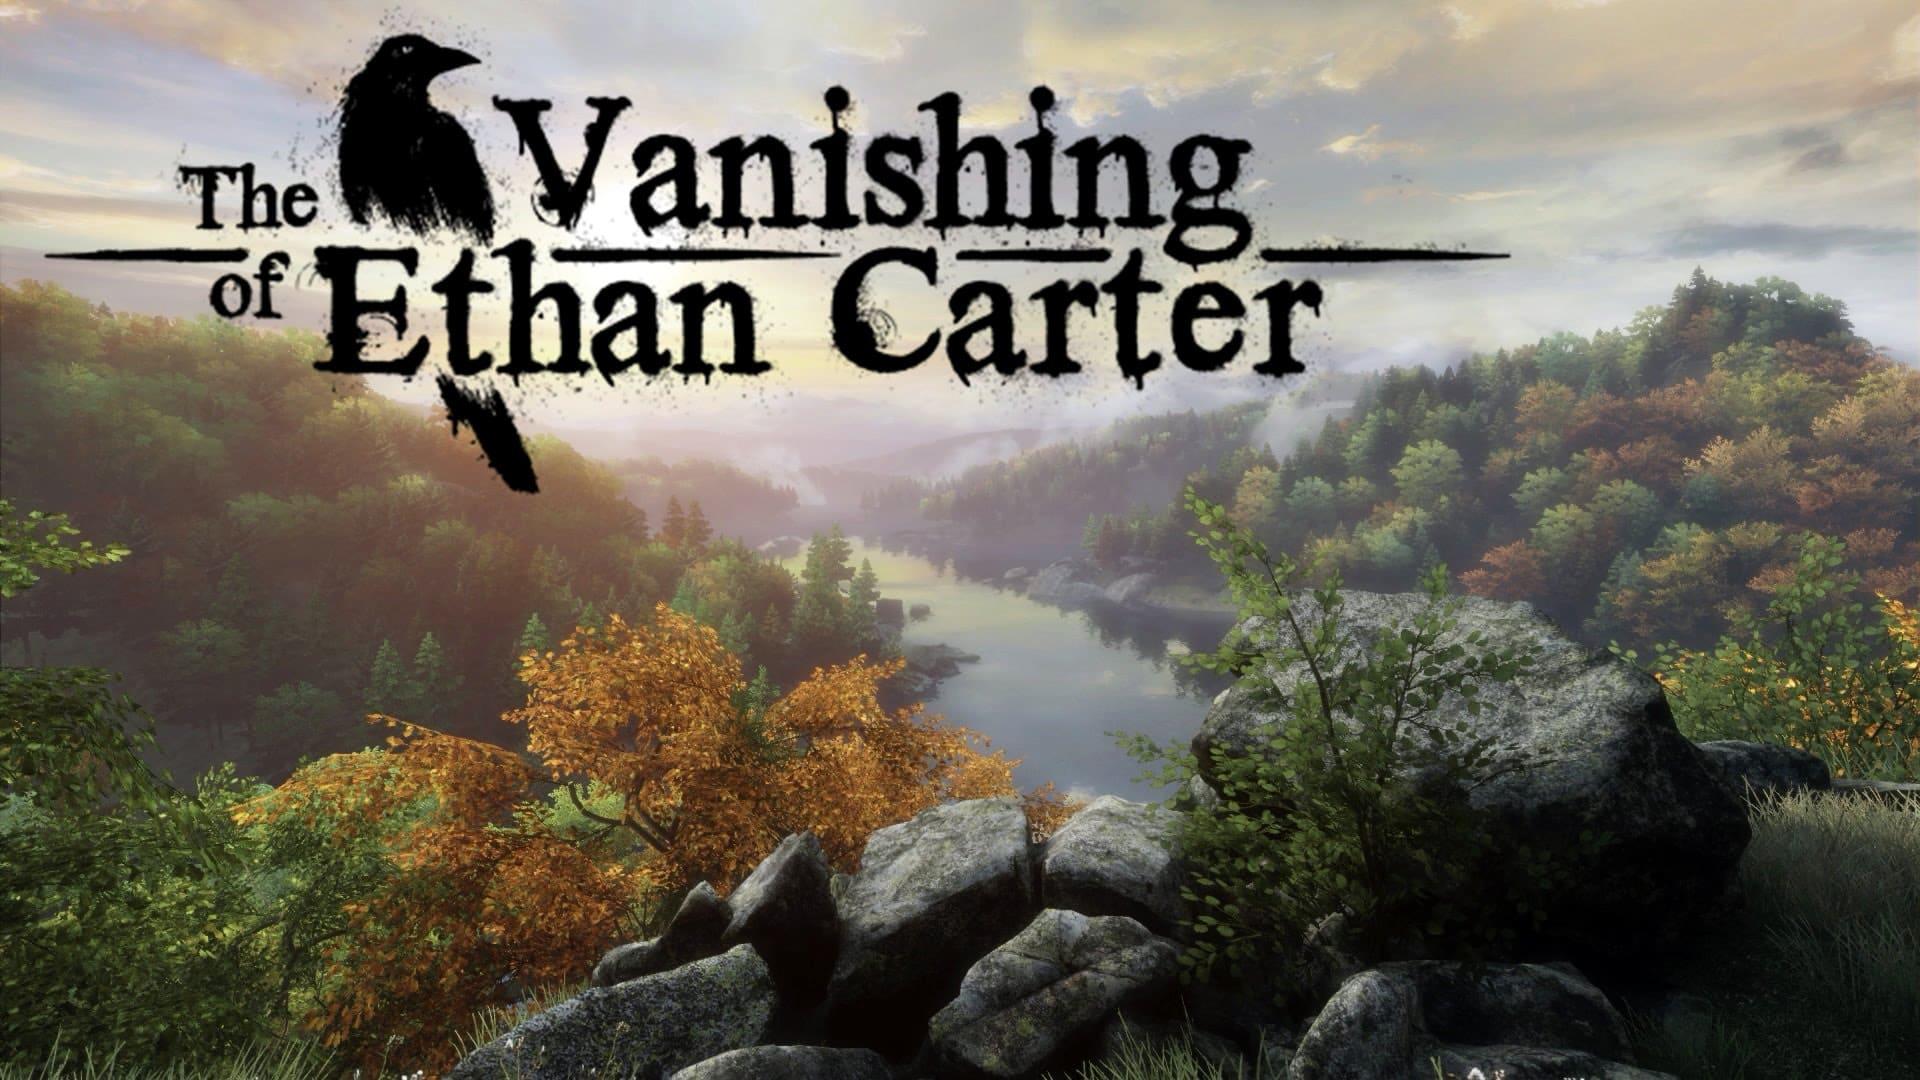 The Vanishing of Ethan Carter telecharger gratuit de PC et Torrent